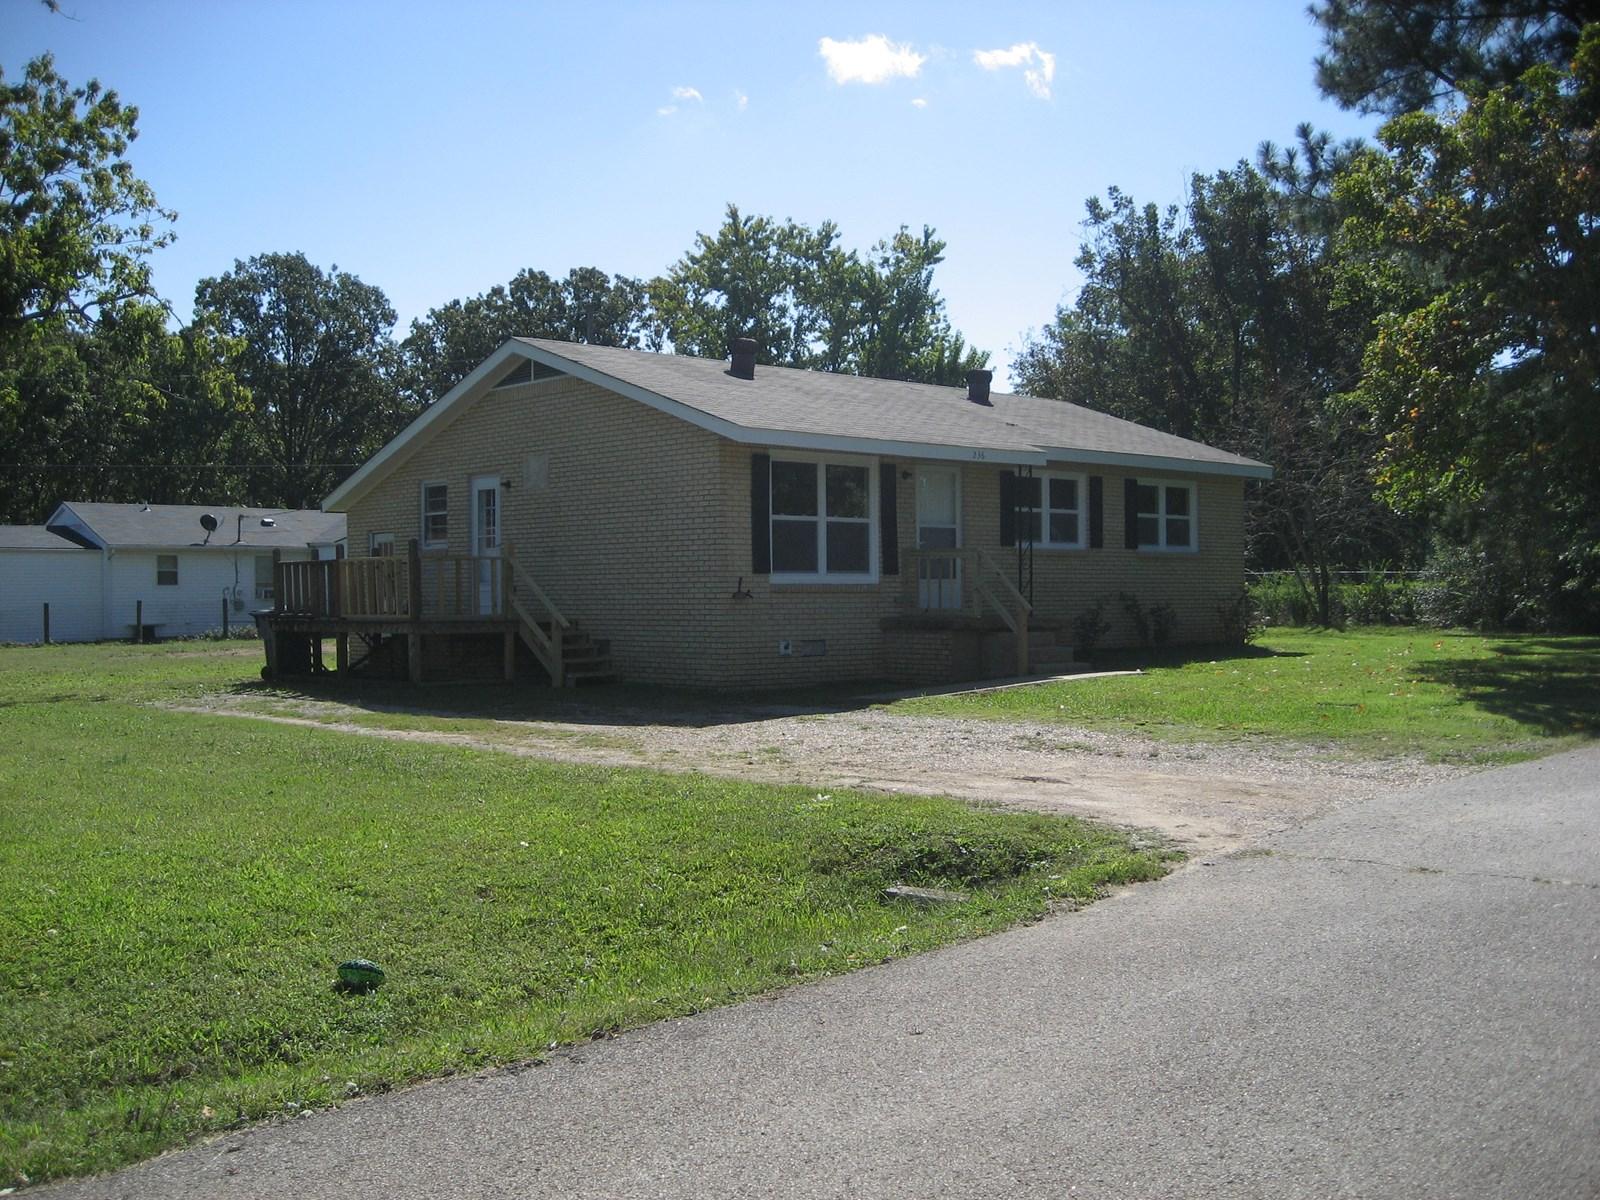 3 BEDROOM HOME FOR SALE IN ADAMSVILLE, TN NEAR PARK & SCHOOL